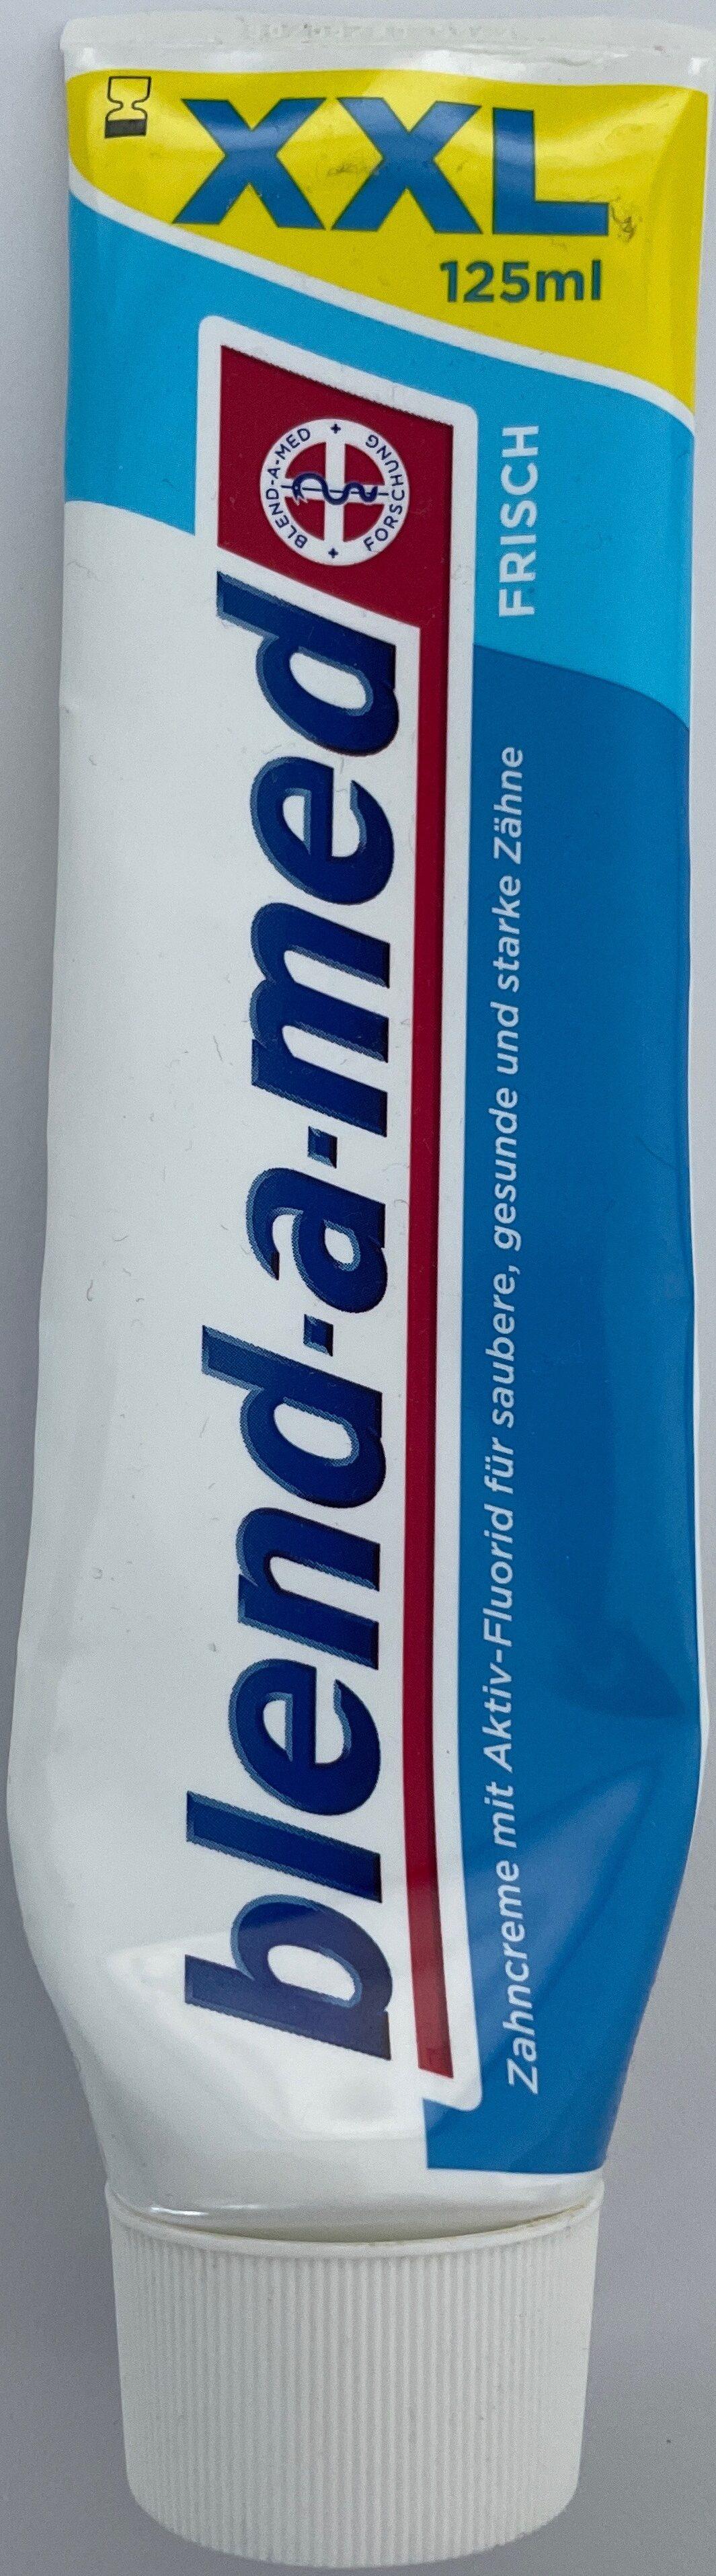 Zahncreme mit Fluorid - Product - de